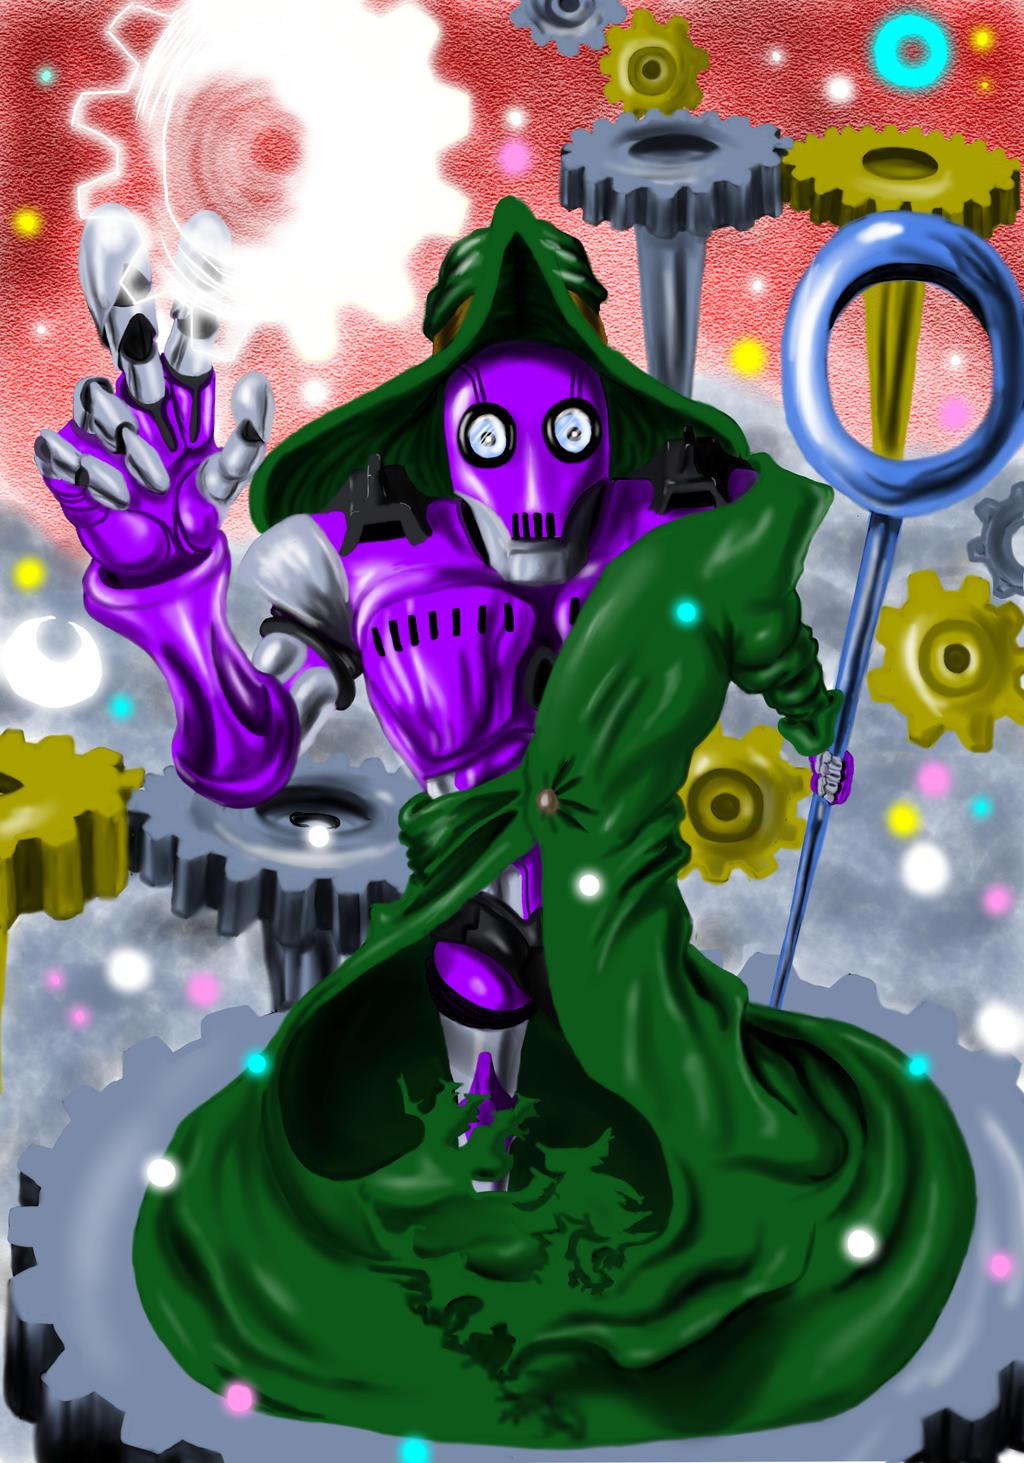 Magician Robot by DDensetsu